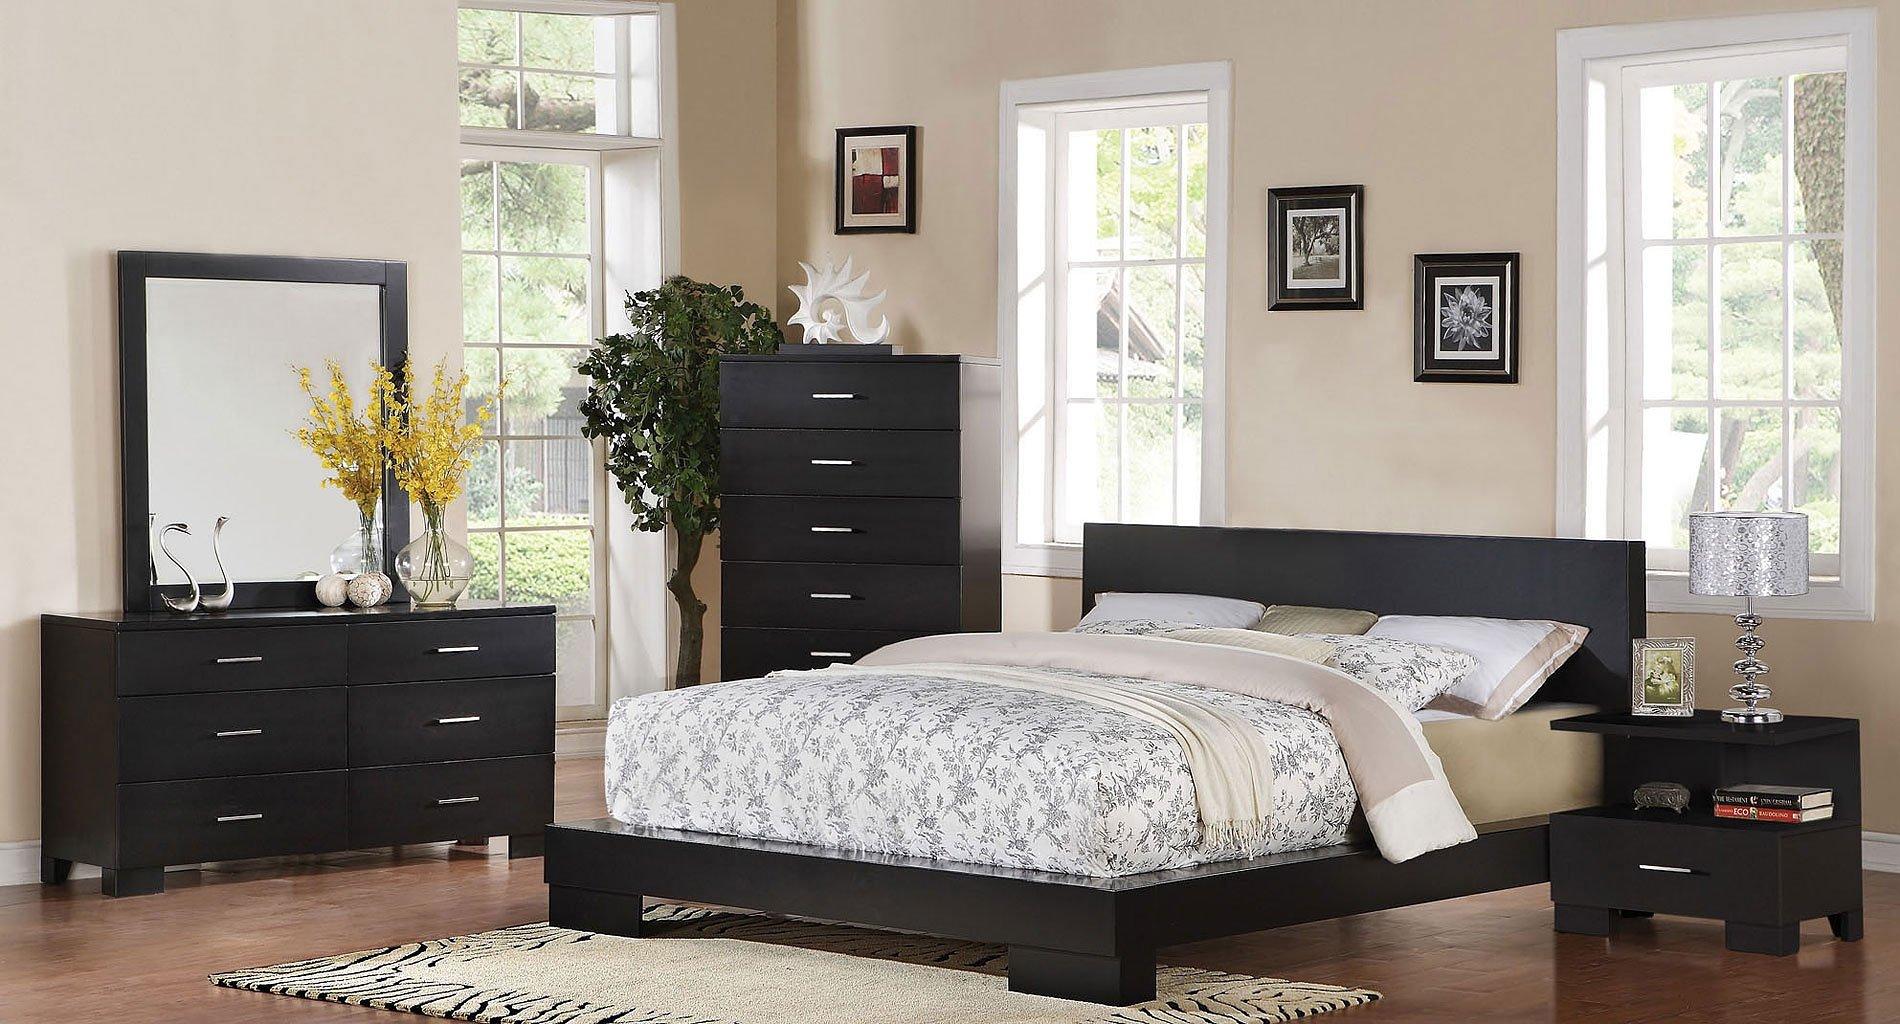 London Low Profile Bedroom Set (Black) Acme Furniture | Furniture Cart